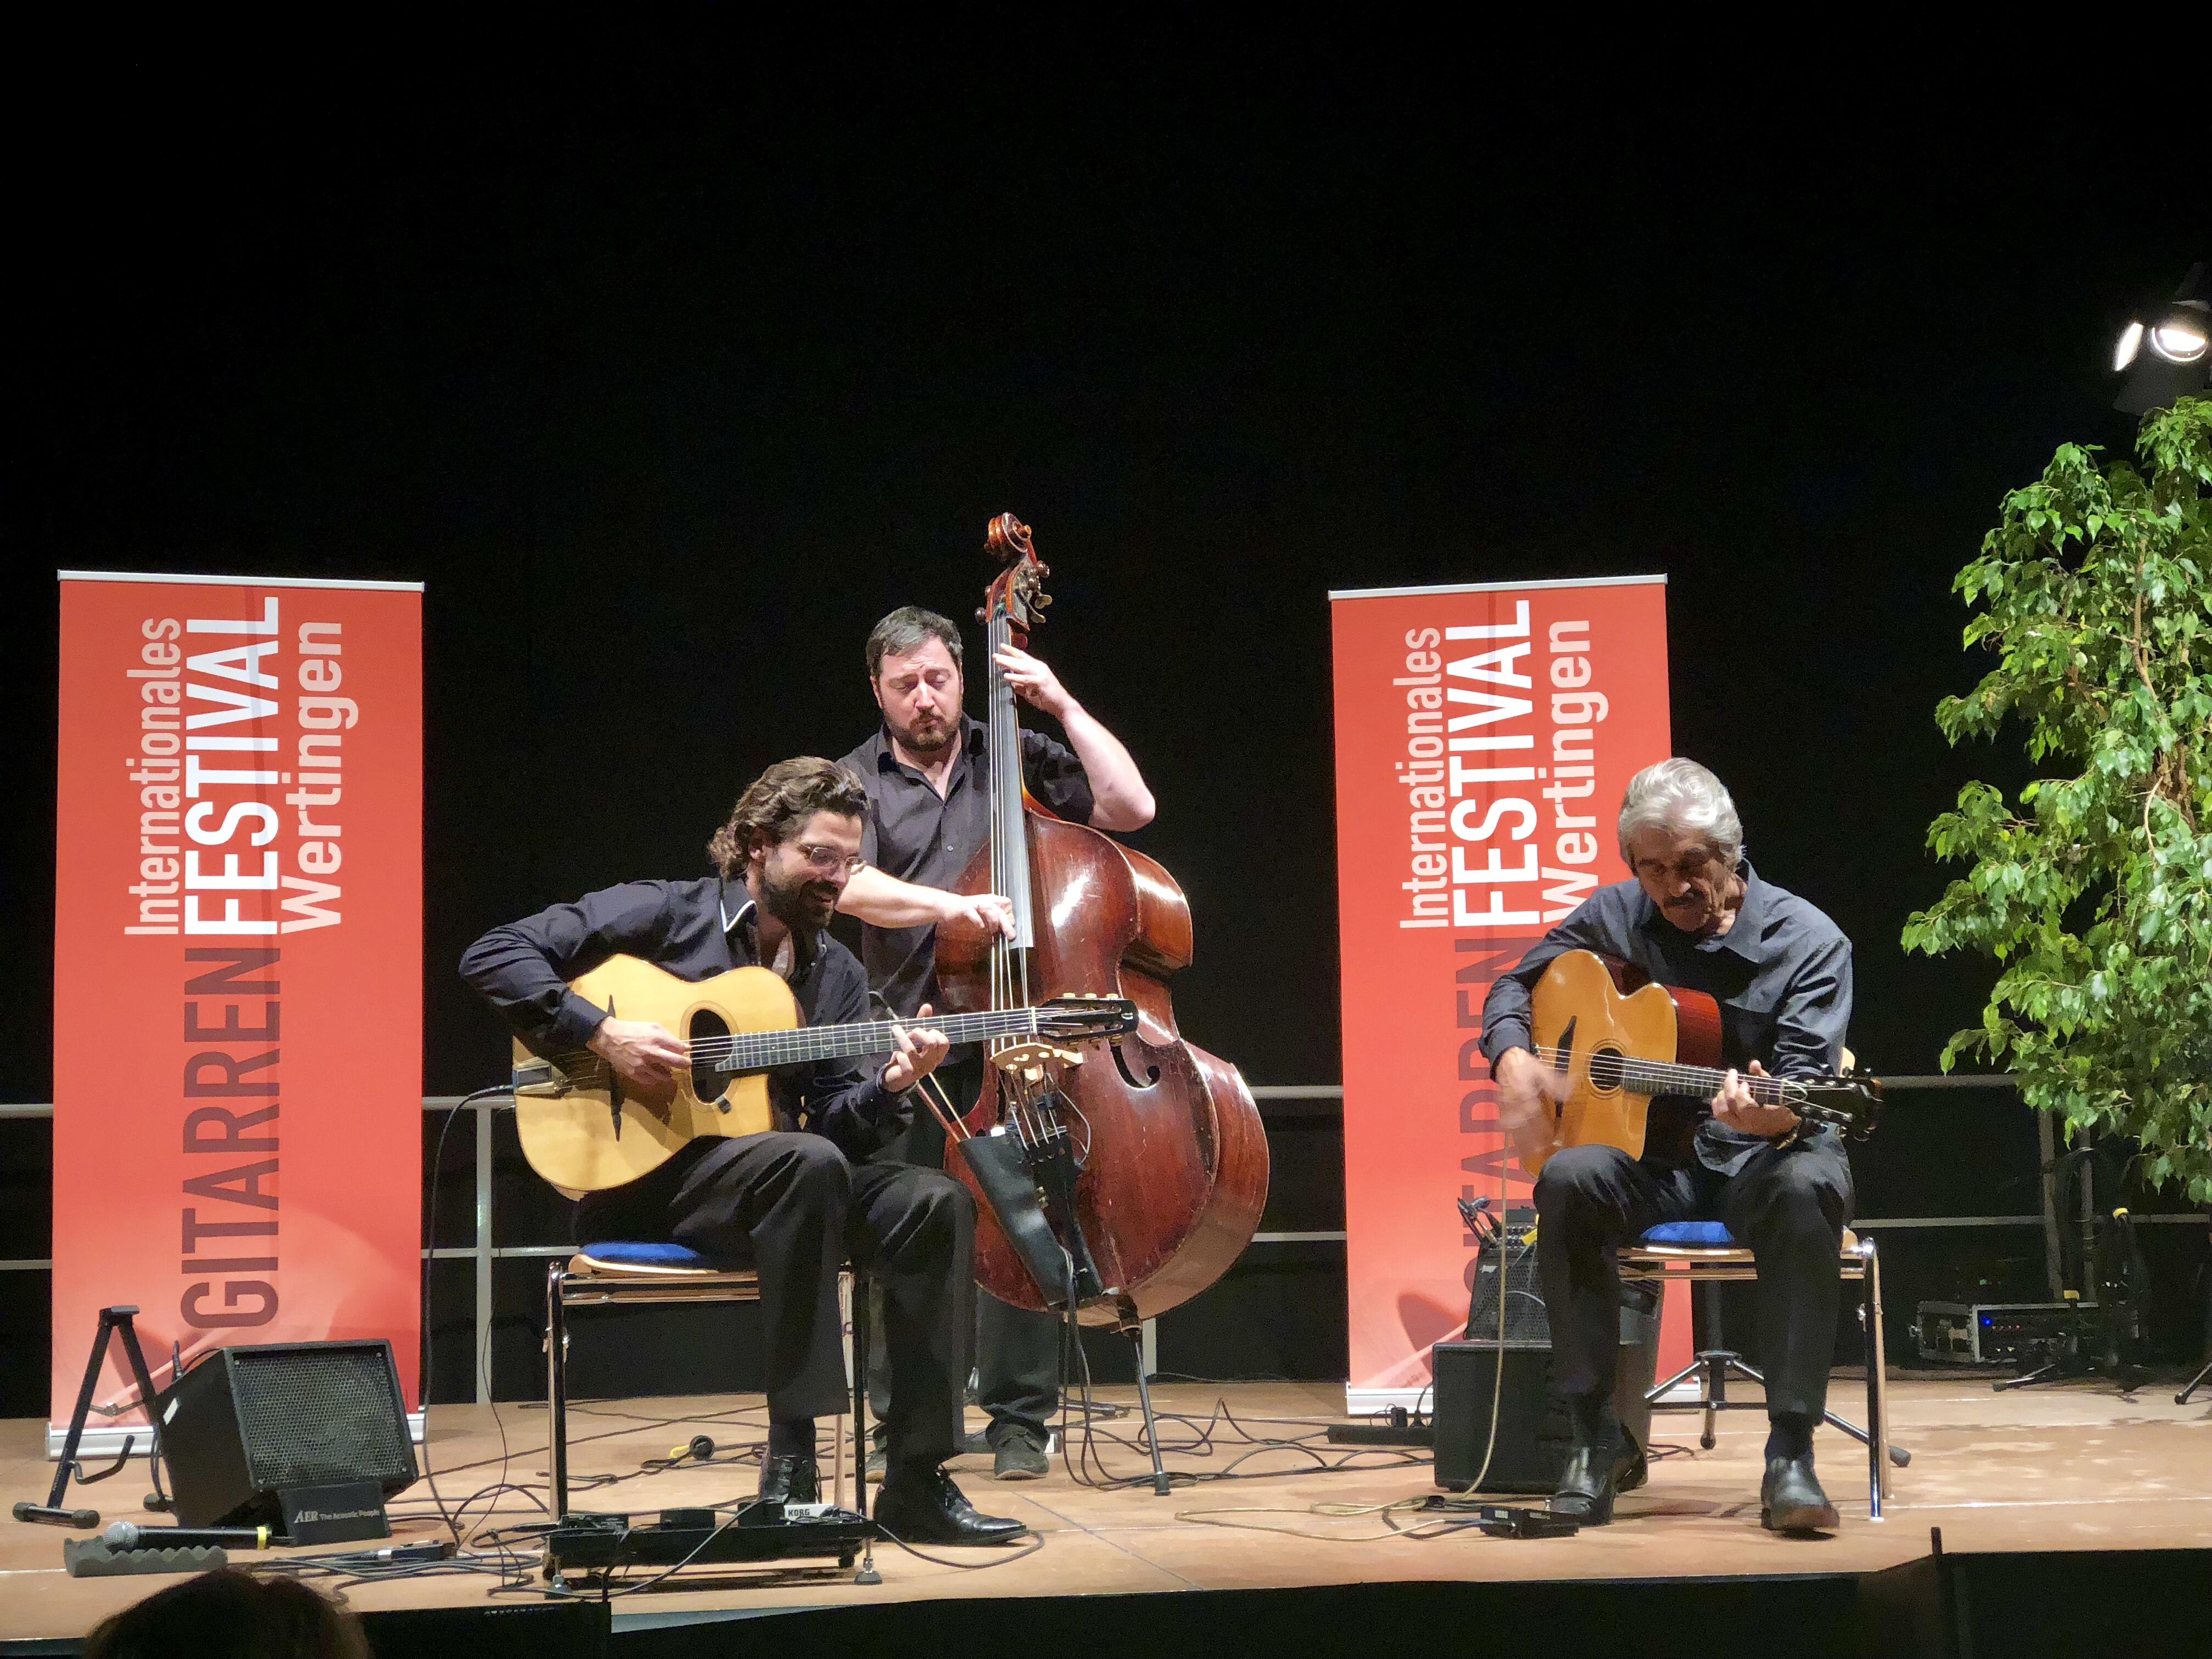 Das Joscho Stephan Trio in Wertingen!